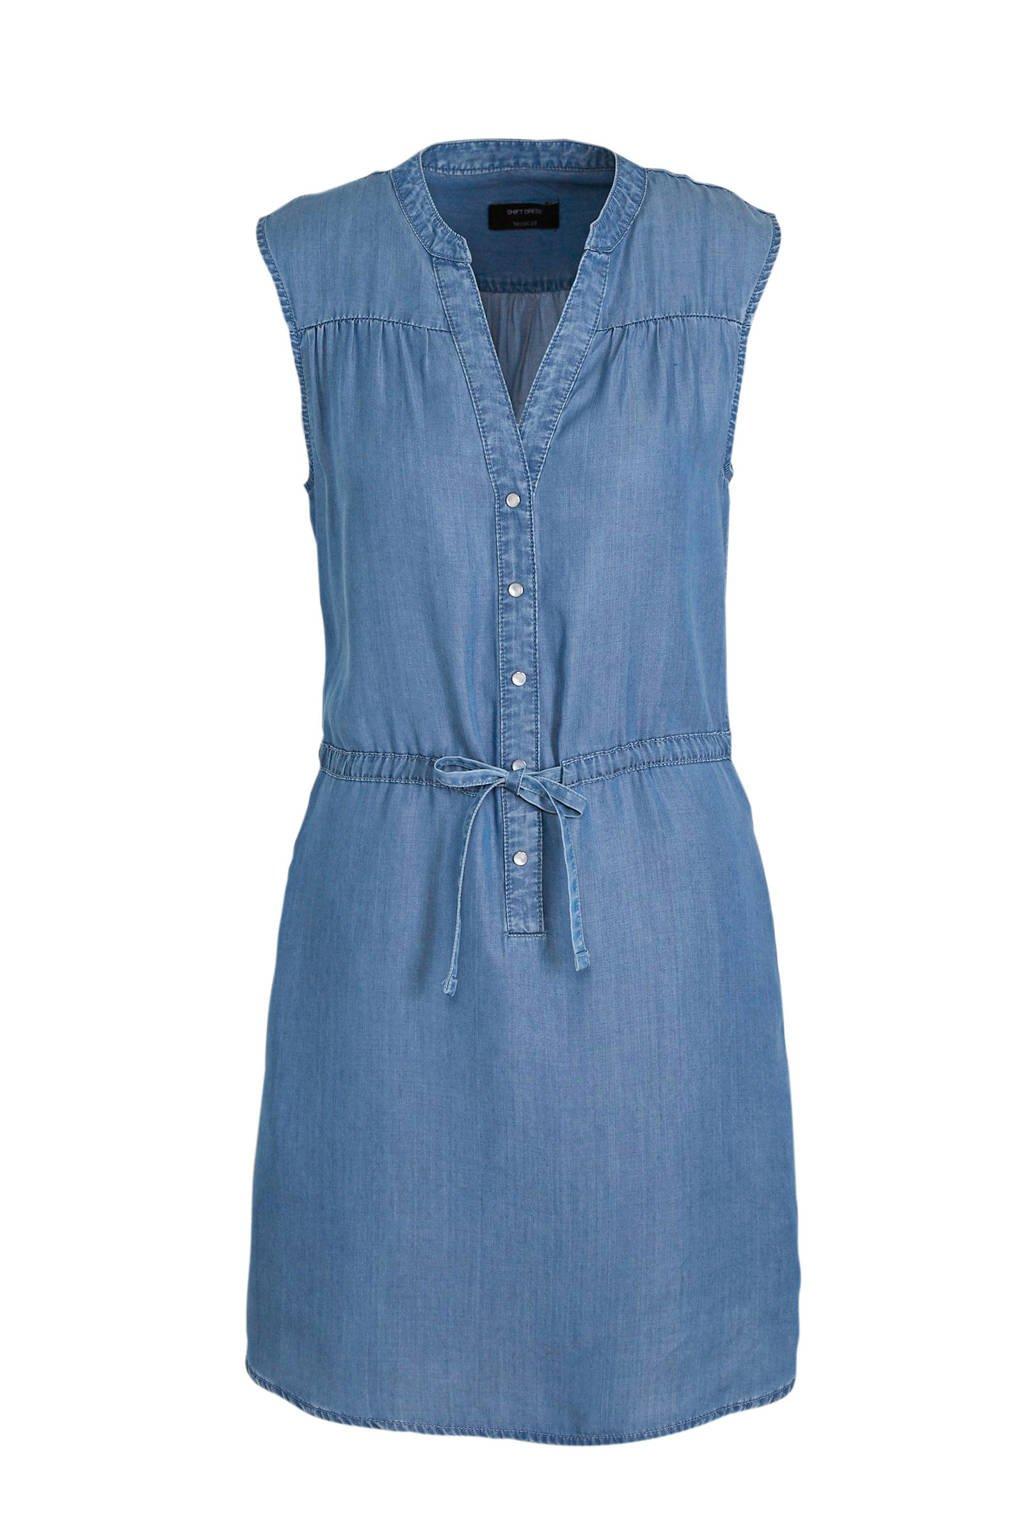 C&A Yessica jurk met plooien blauw, Blauw